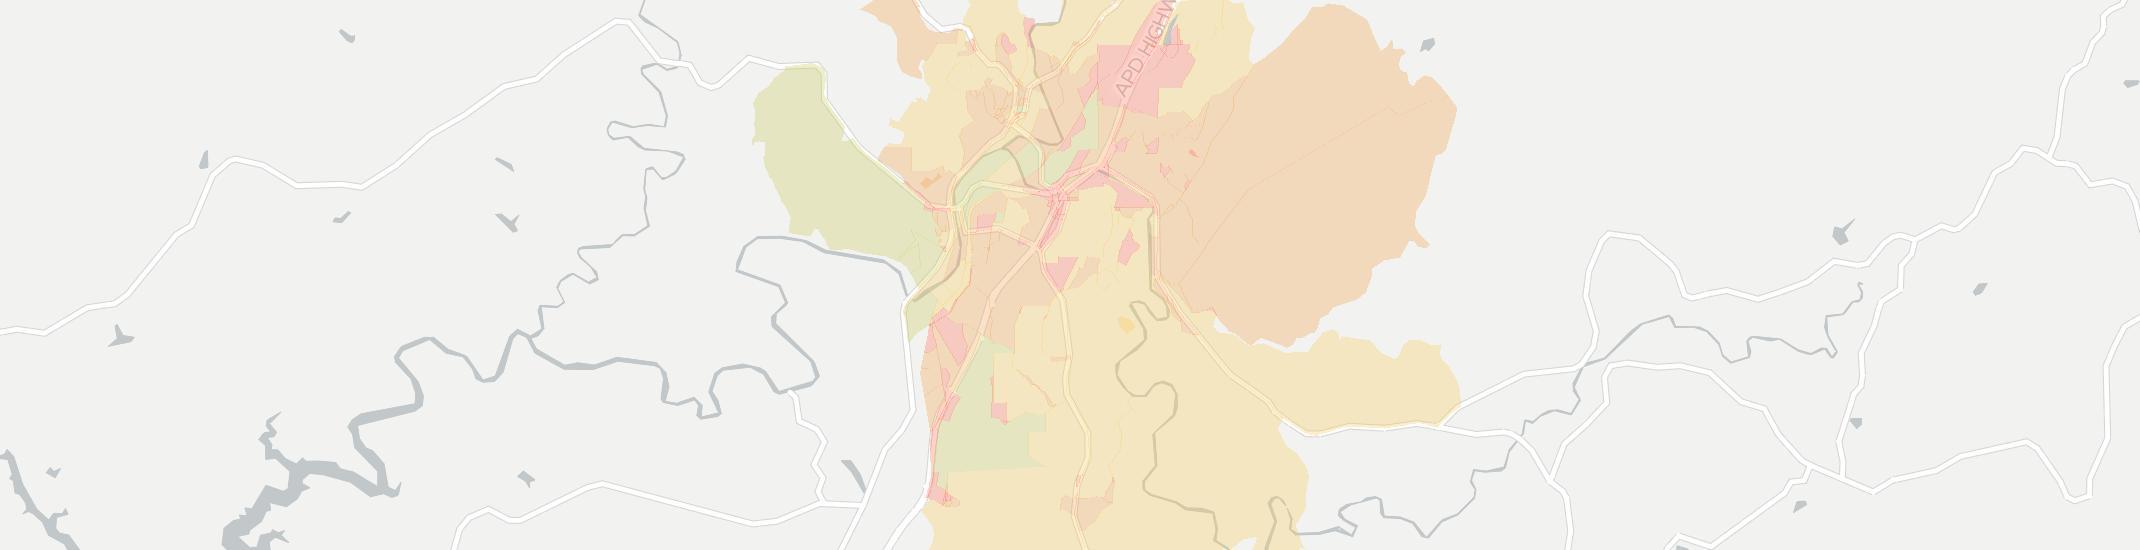 Map Of Georgia Ellijay.Internet Providers In East Ellijay Ga Compare 8 Providers